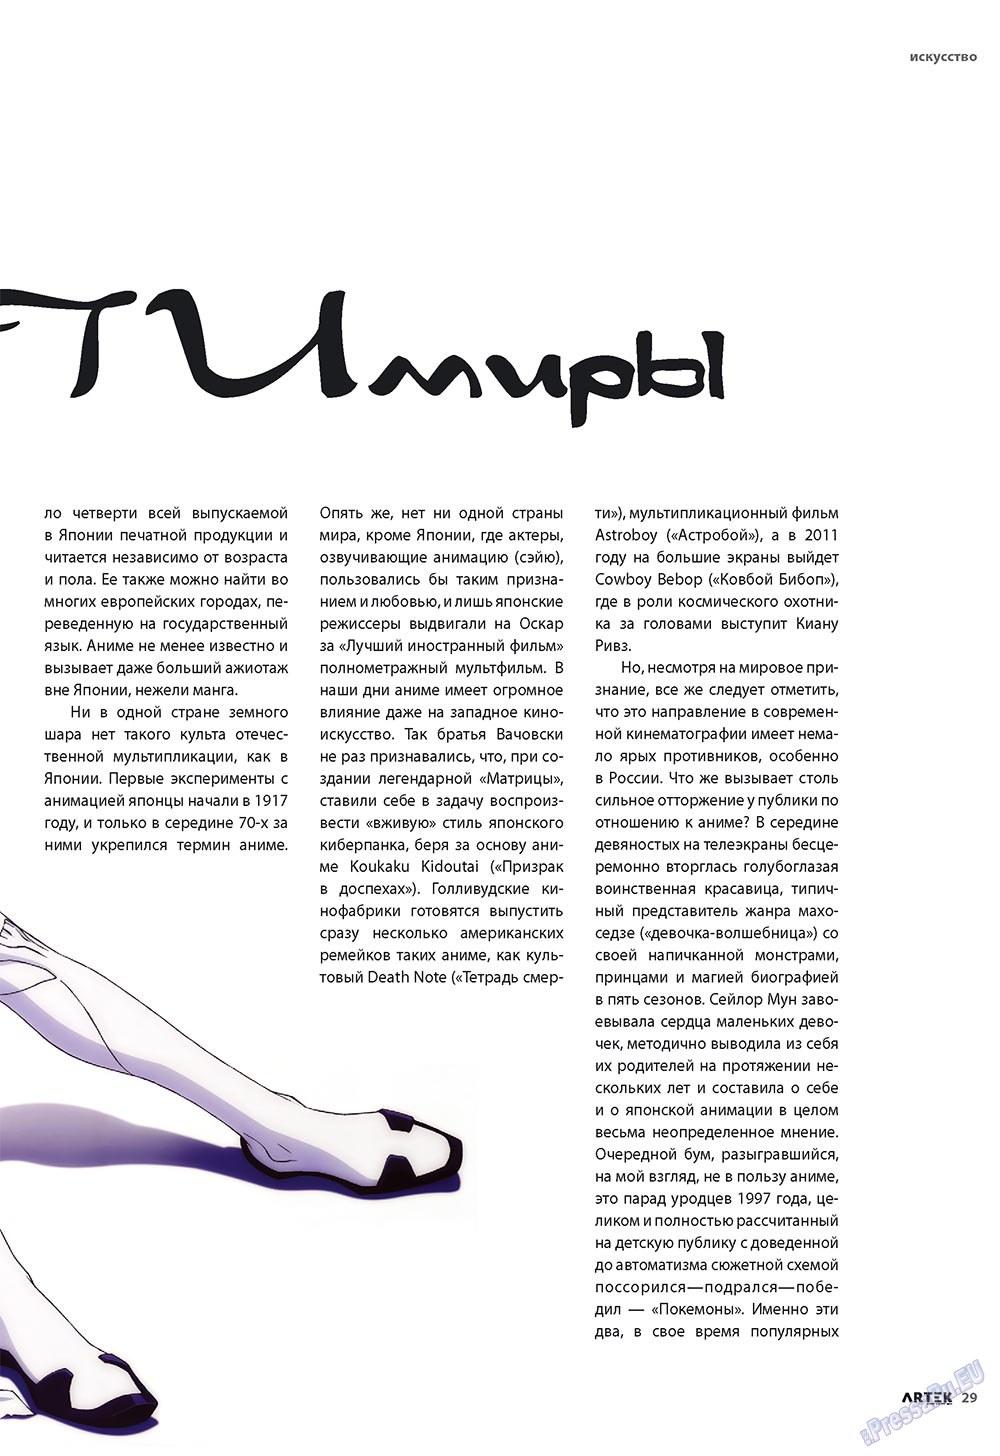 Артек (журнал). 2009 год, номер 5, стр. 29